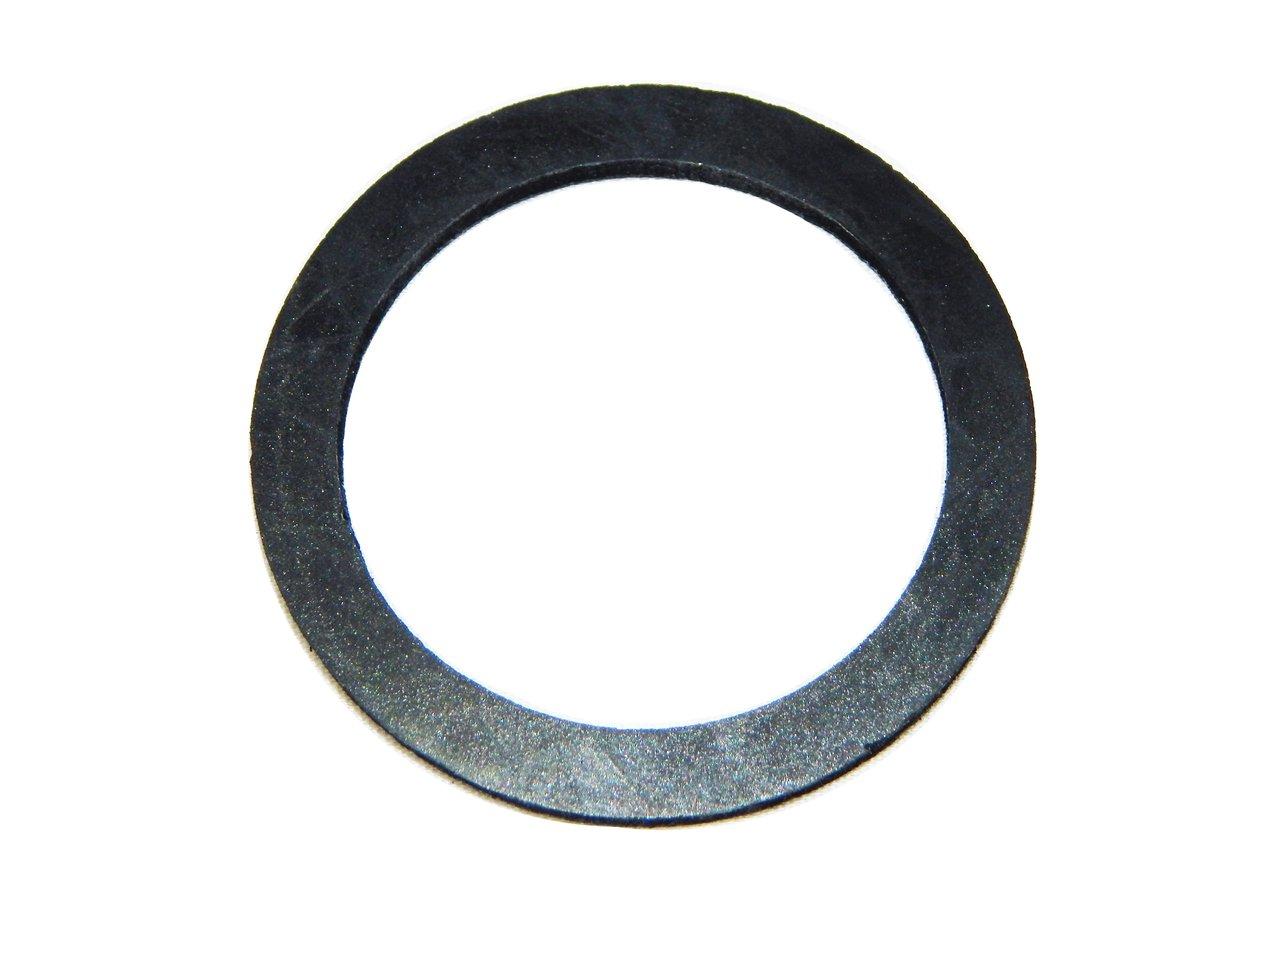 Wacker Neuson Priming Plug Cap Gasket - 0084698